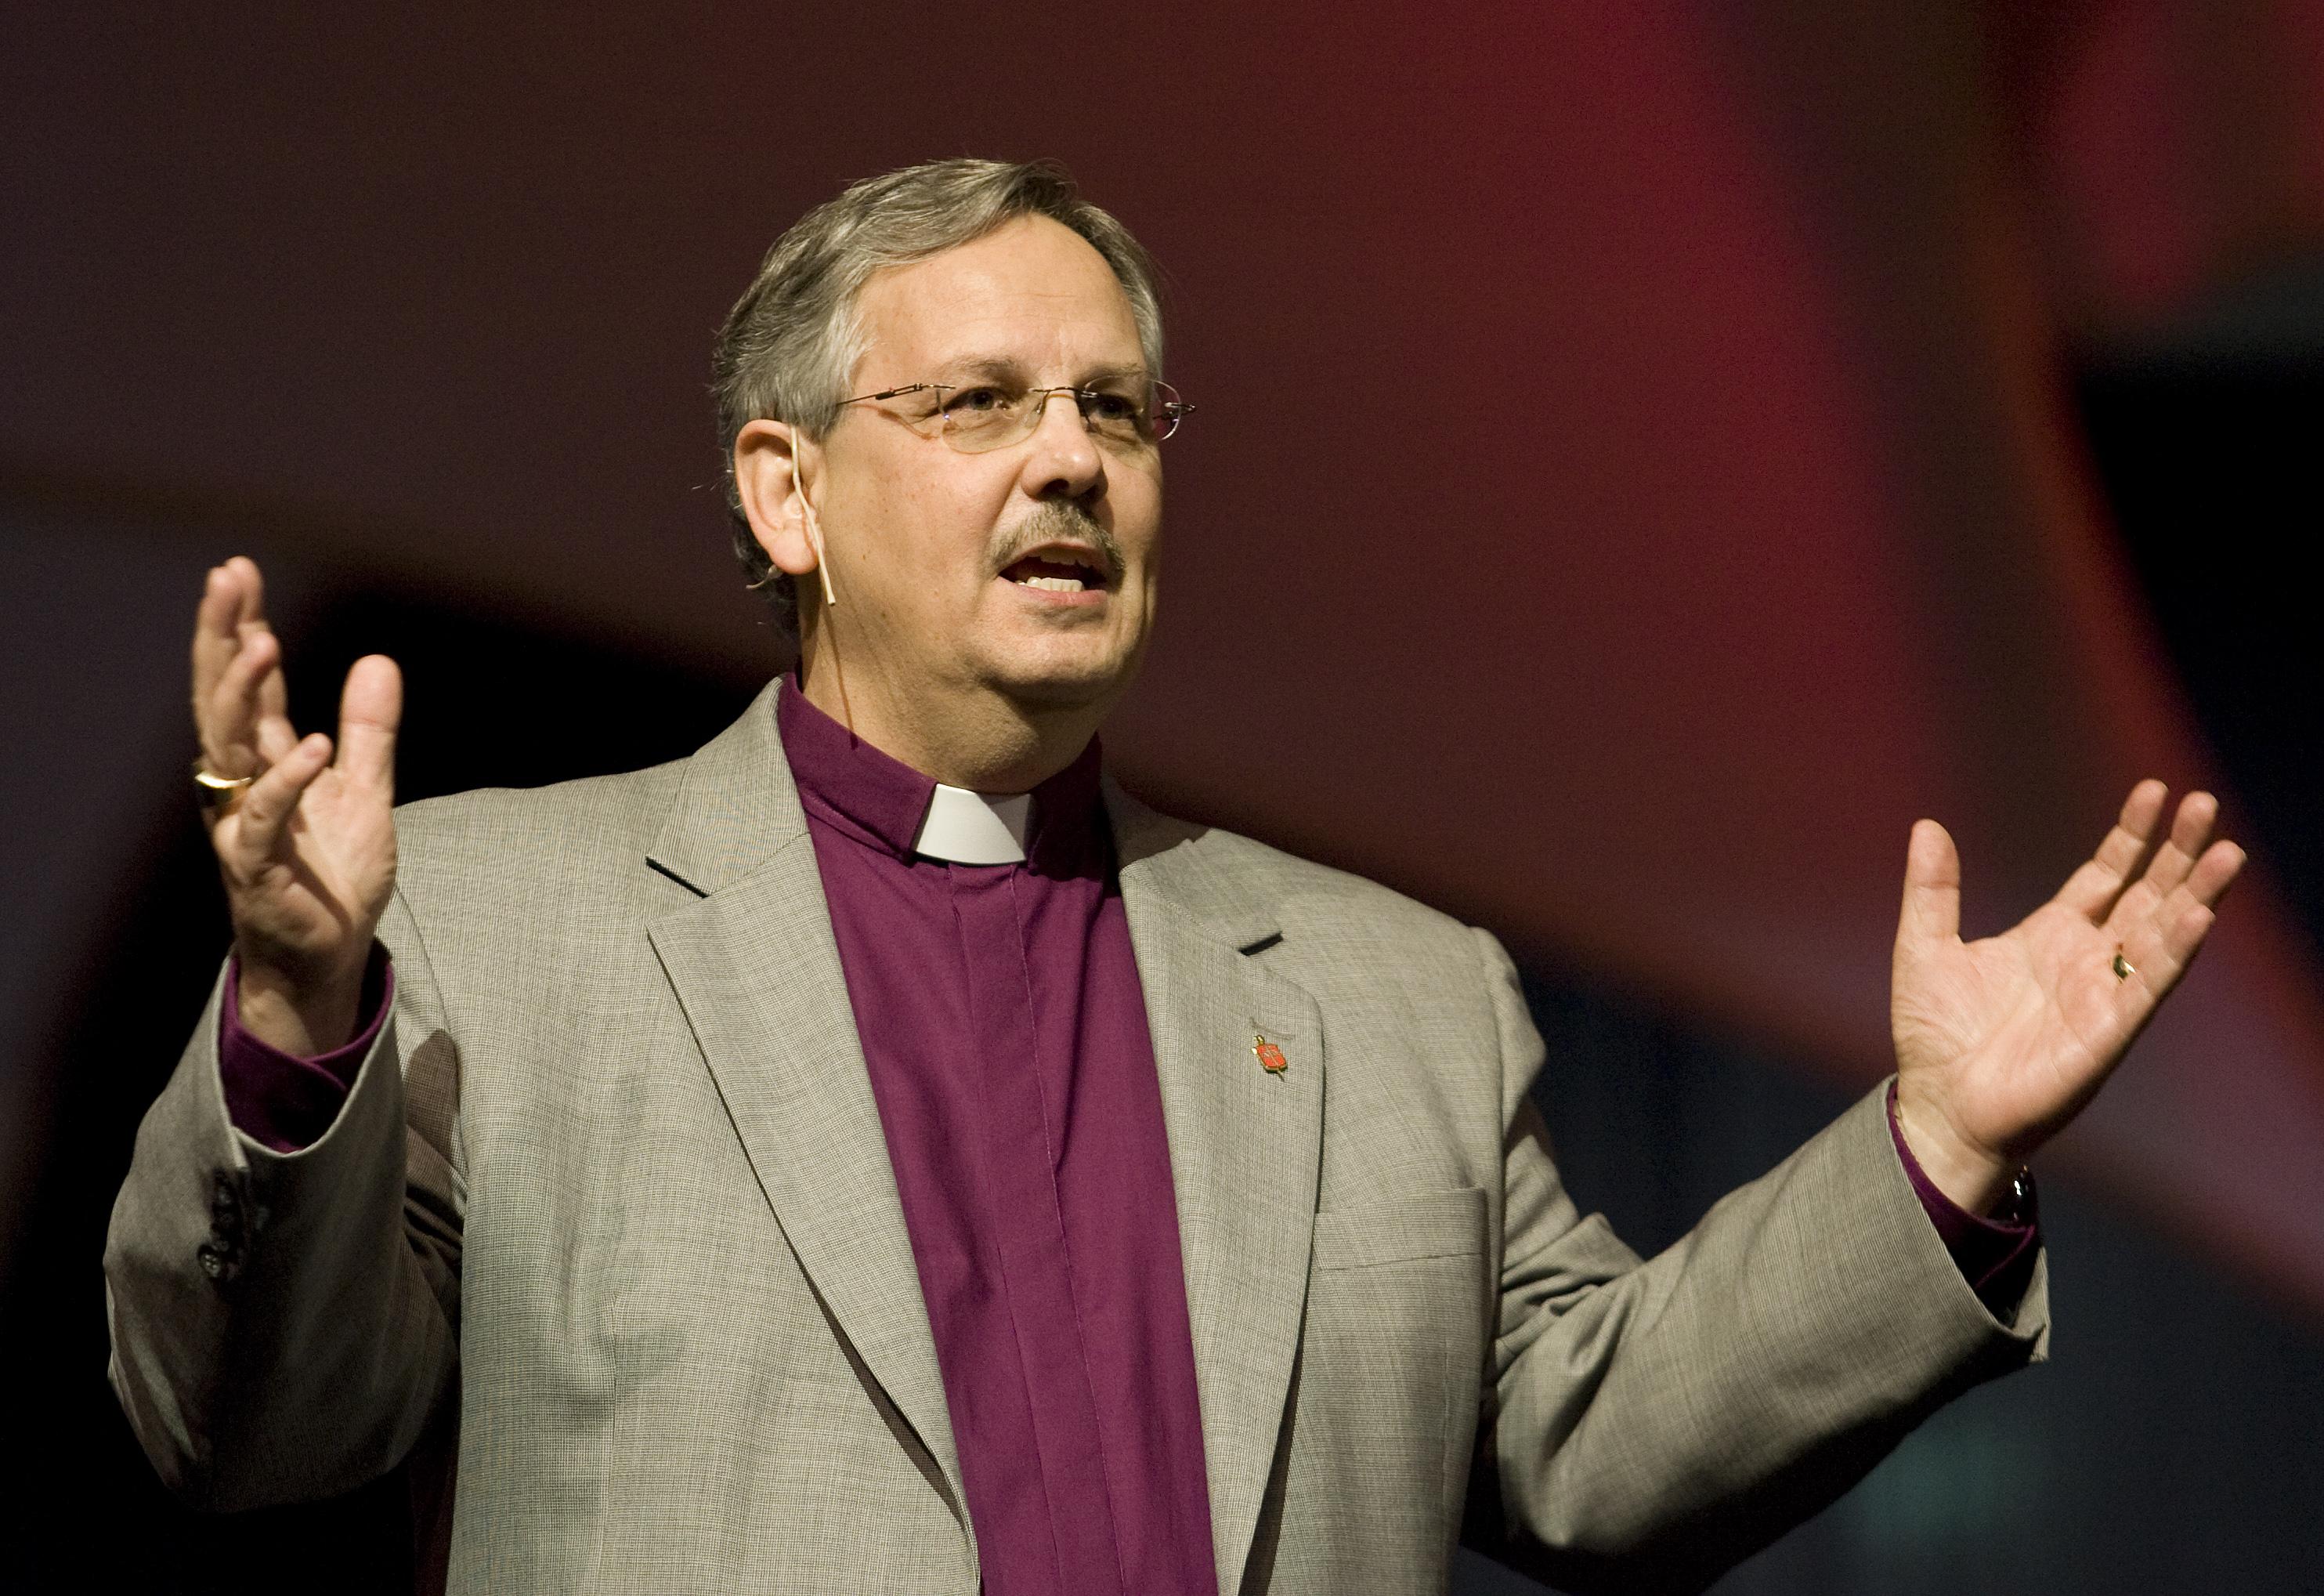 United Methodist Bishop to address Swissvale congregation that is ...